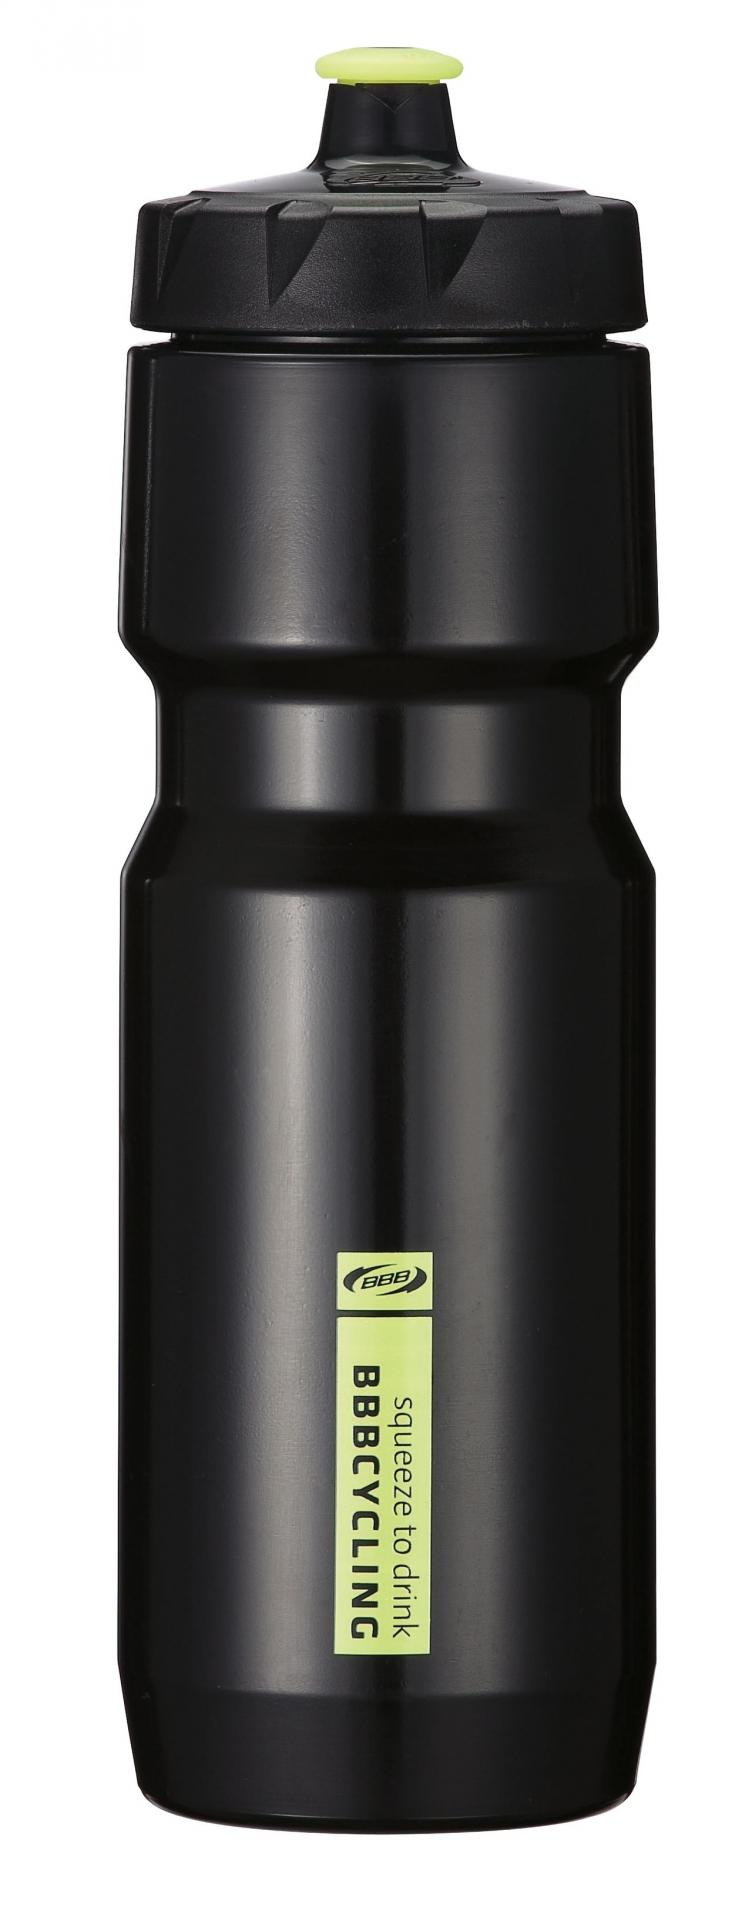 Bidon BBB CompTank 750 ml Noir/Jaune - BWB-05